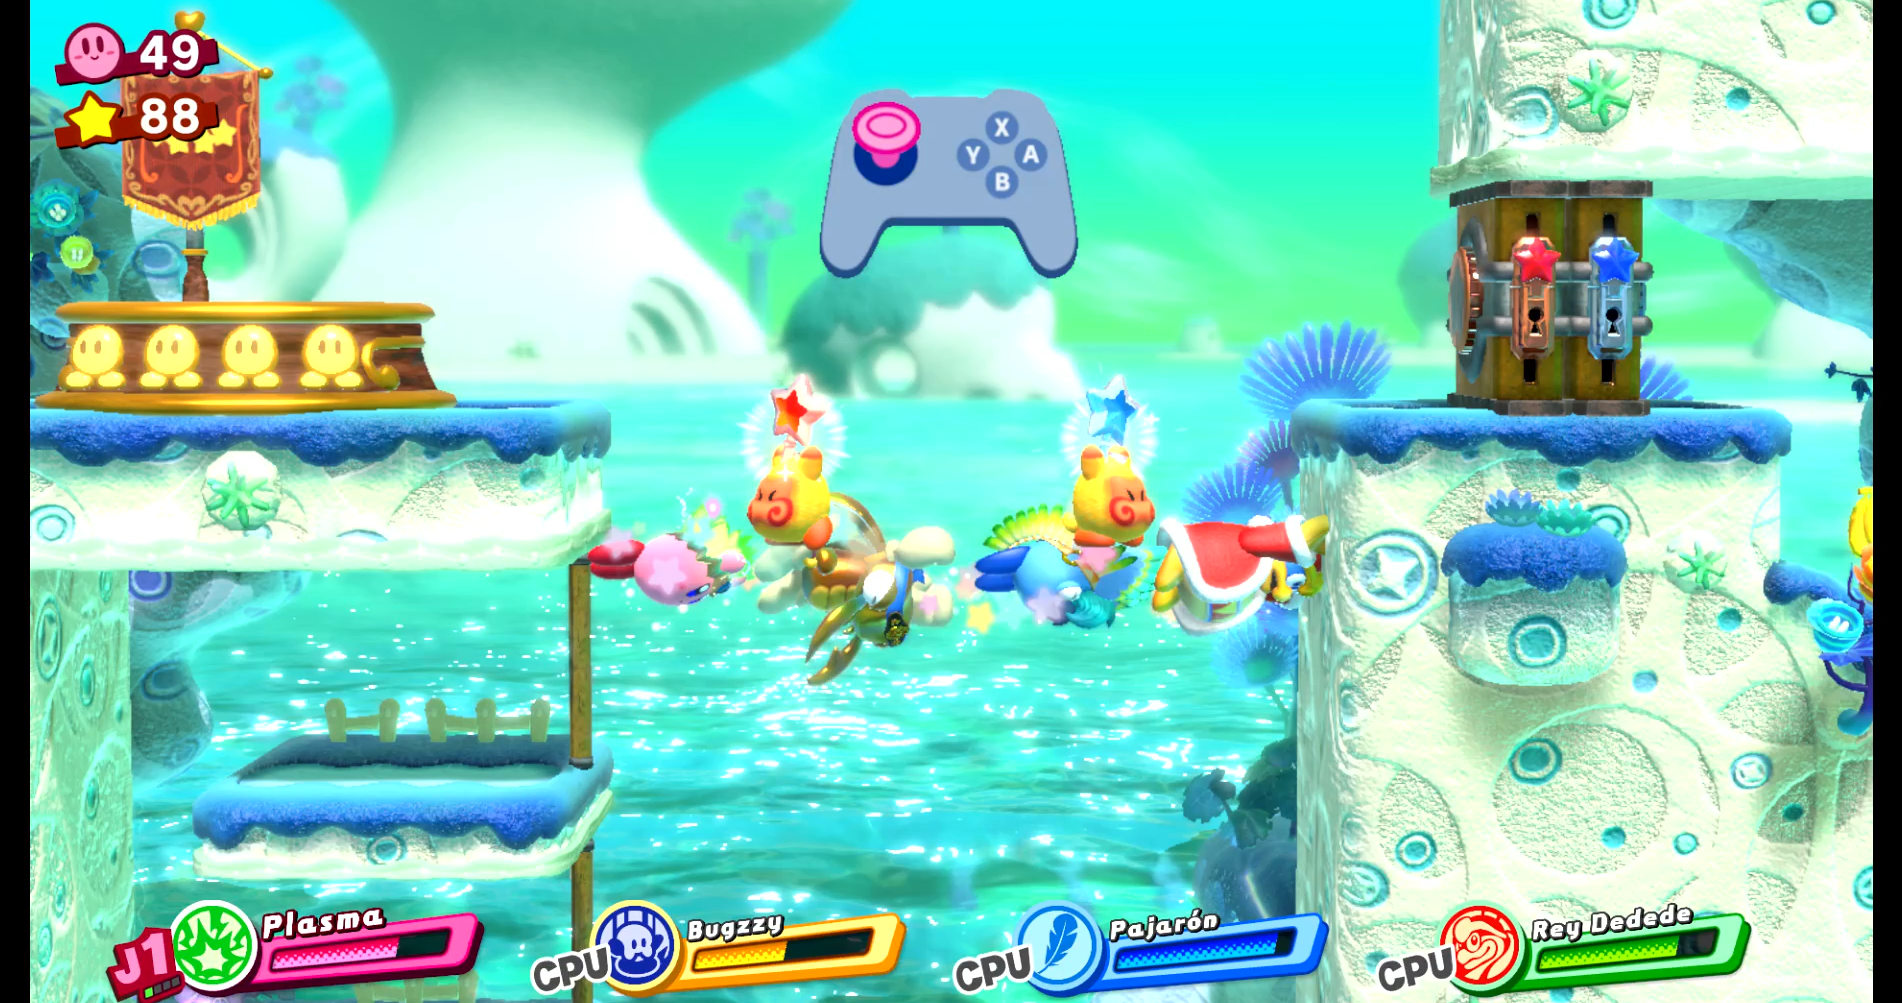 Puzle Kirby